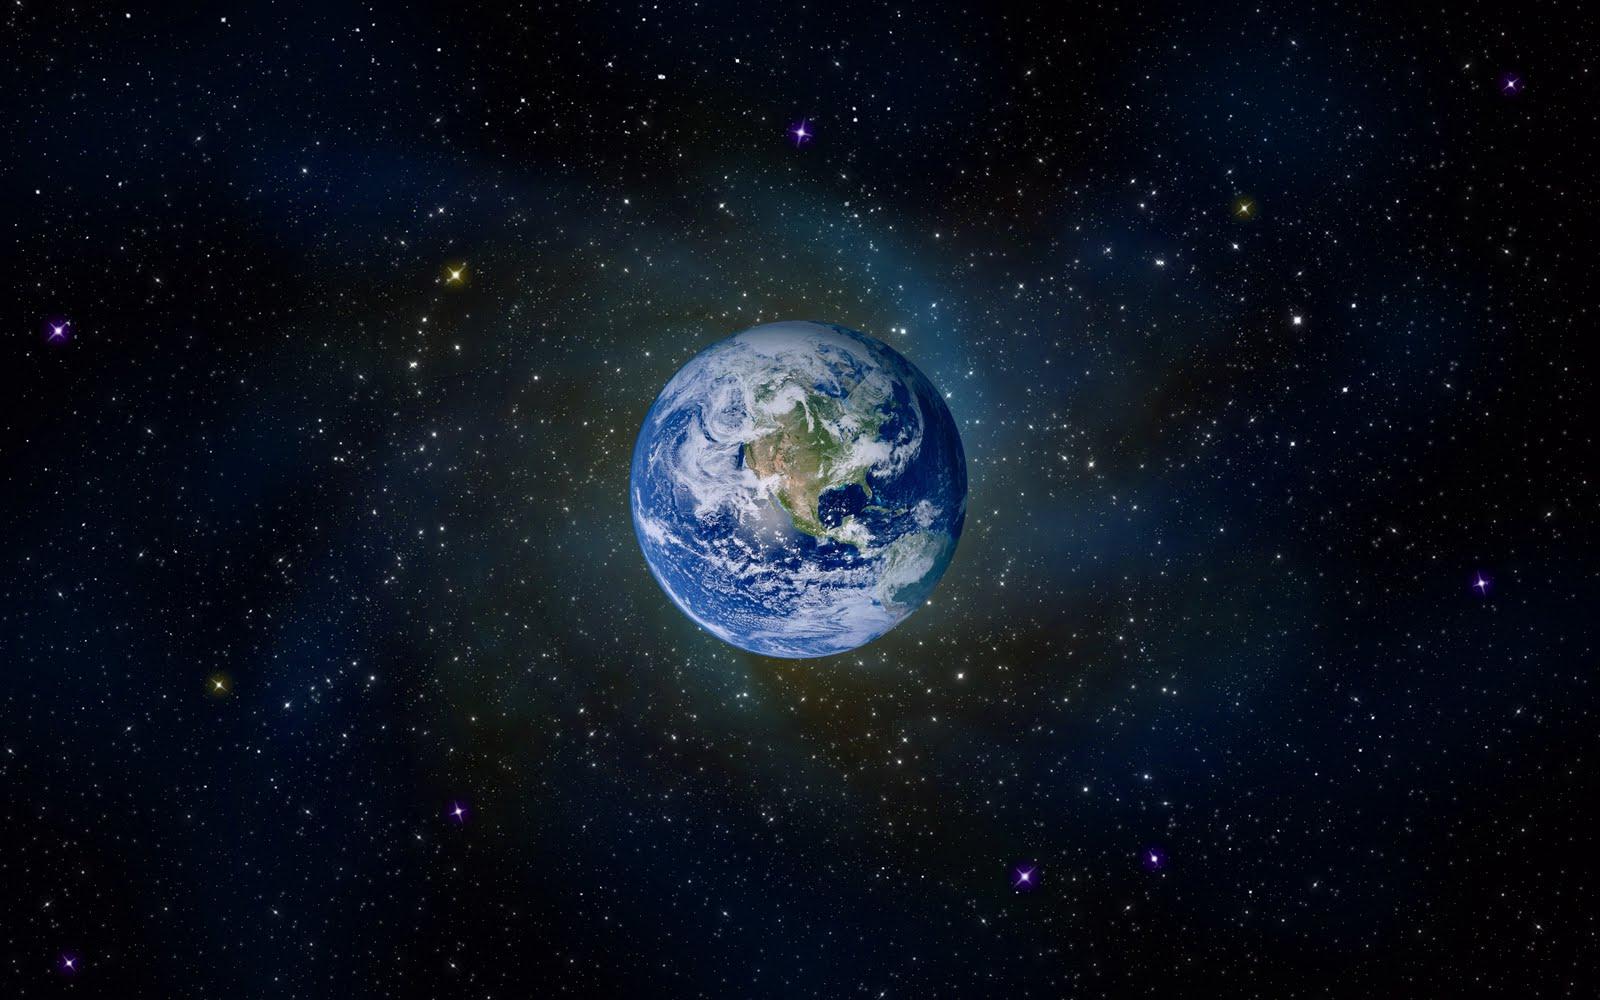 Space Earth Wallpaper Hd Space Wallpaper